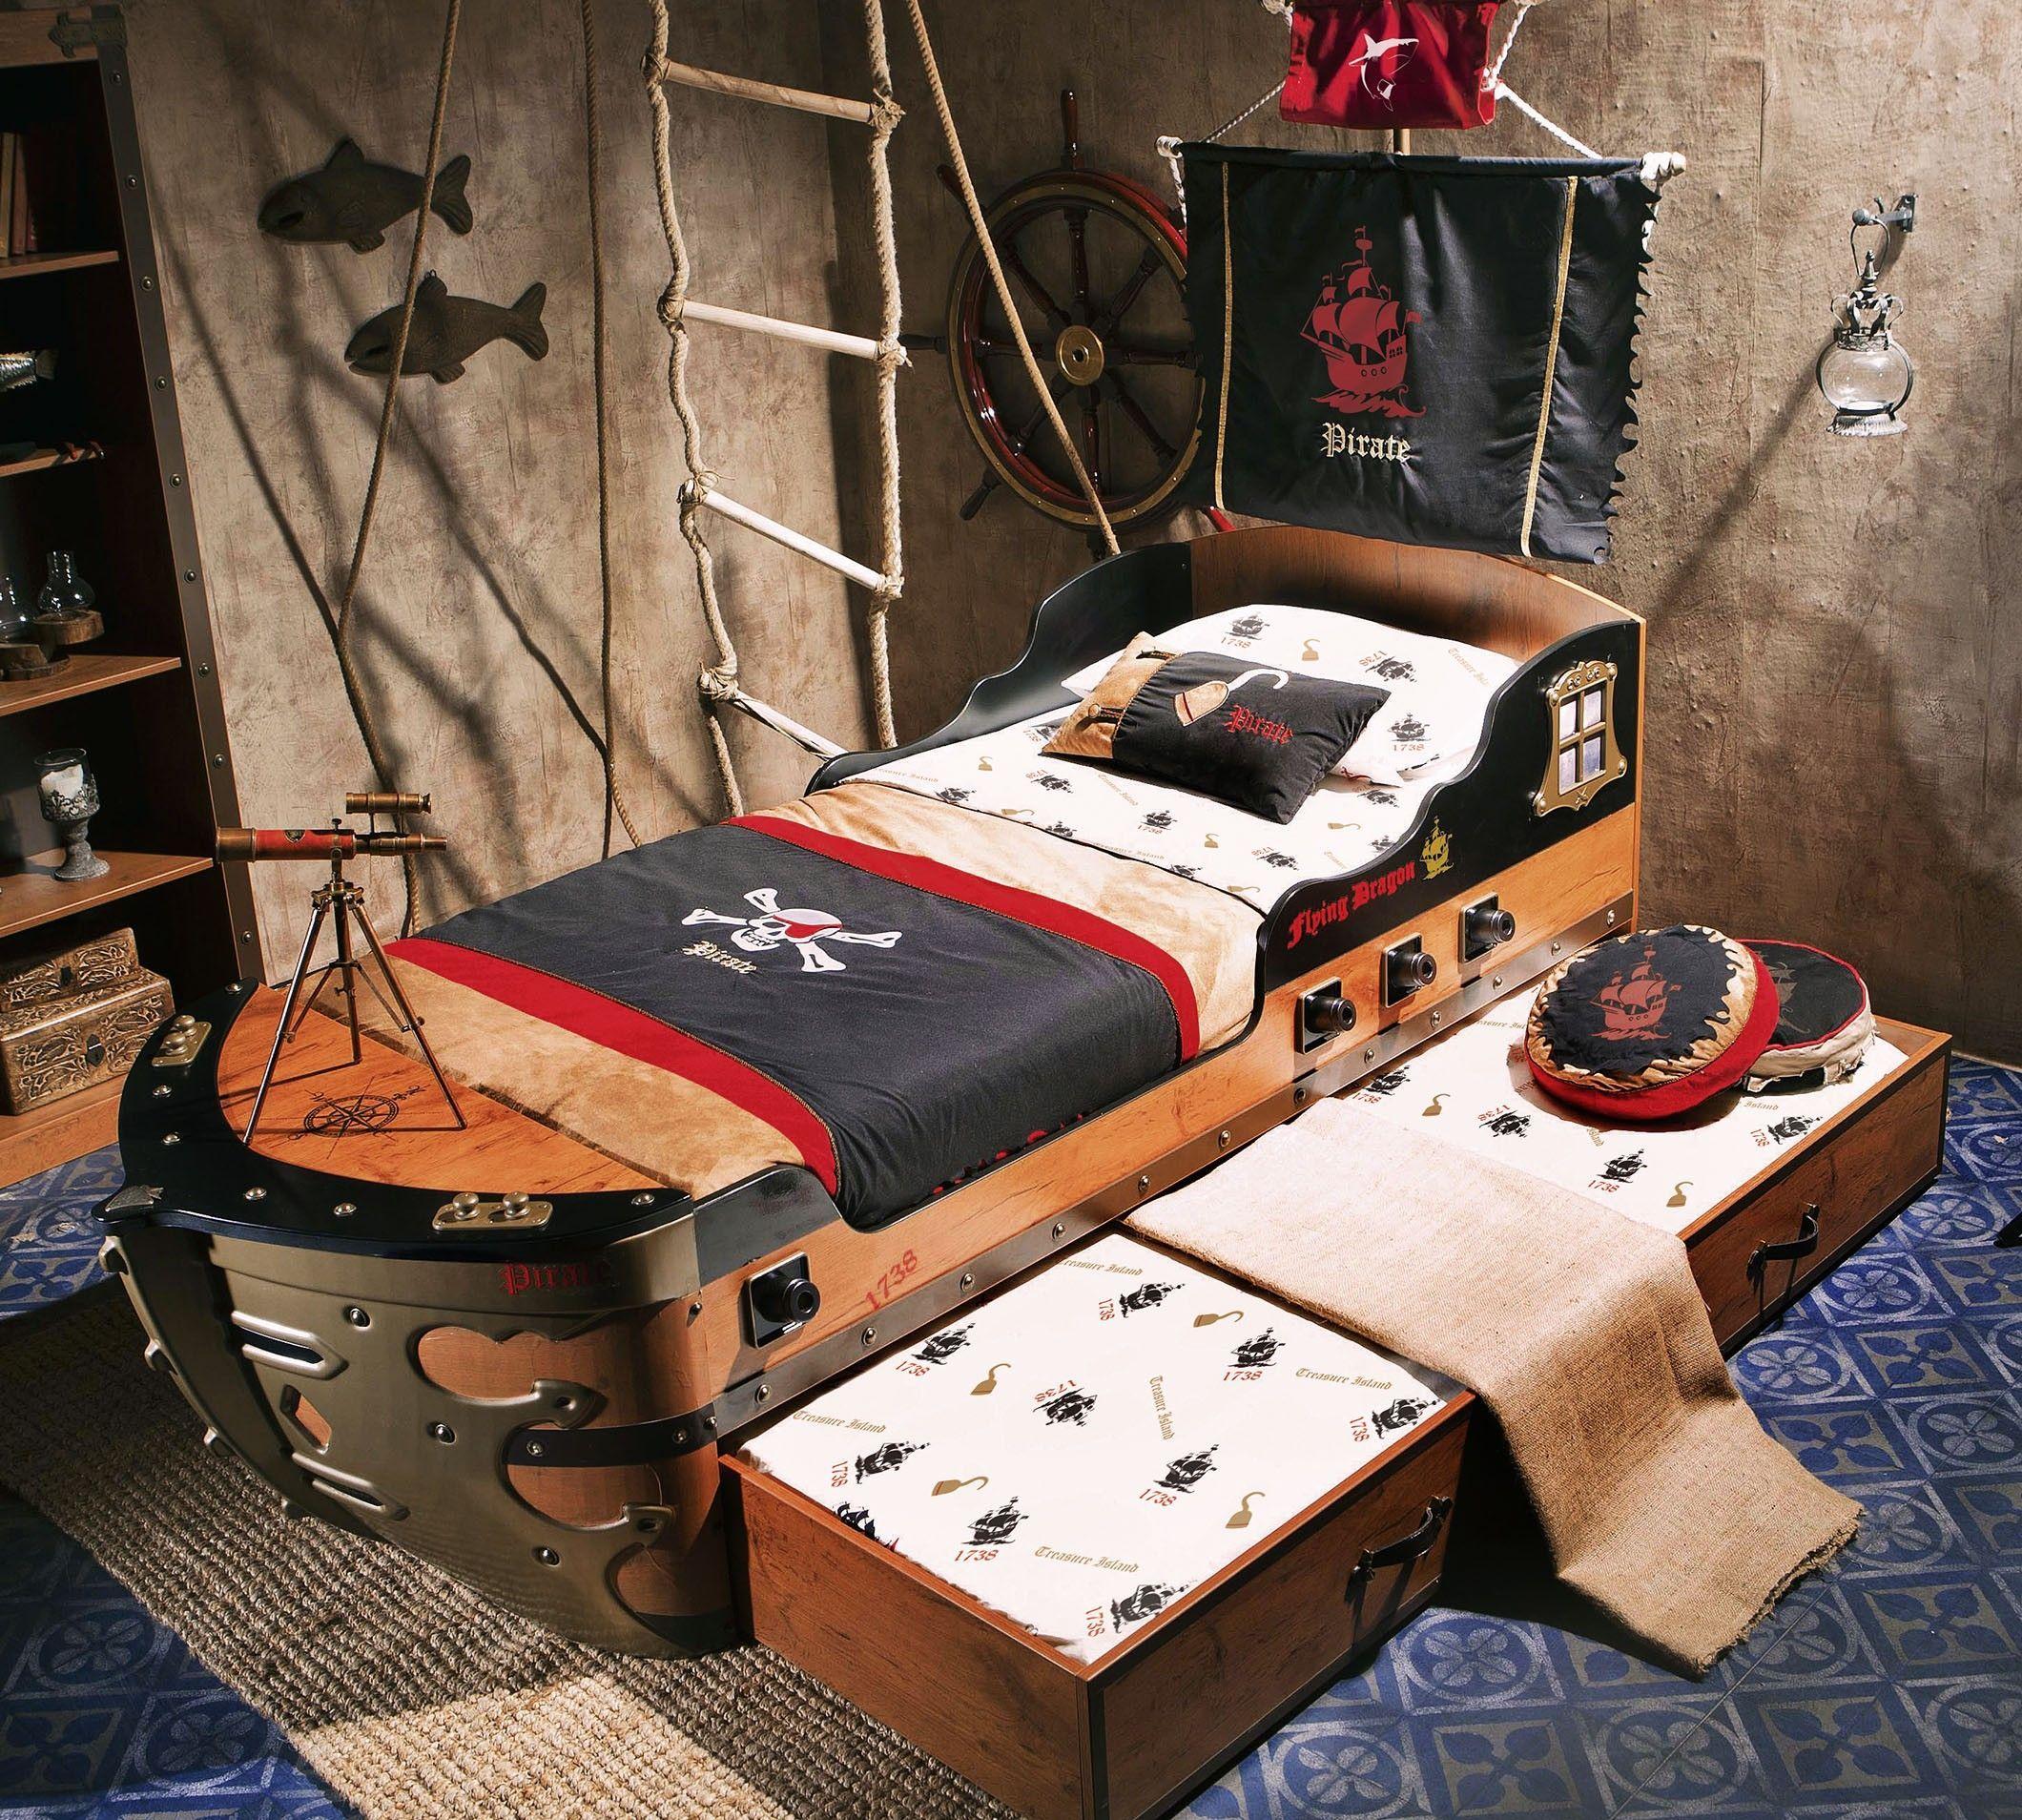 Cilek Pirate Kinderzimmer 4 Teilig In 2021 Kinderzimmer Piraten Zimmer Kinder Zimmer